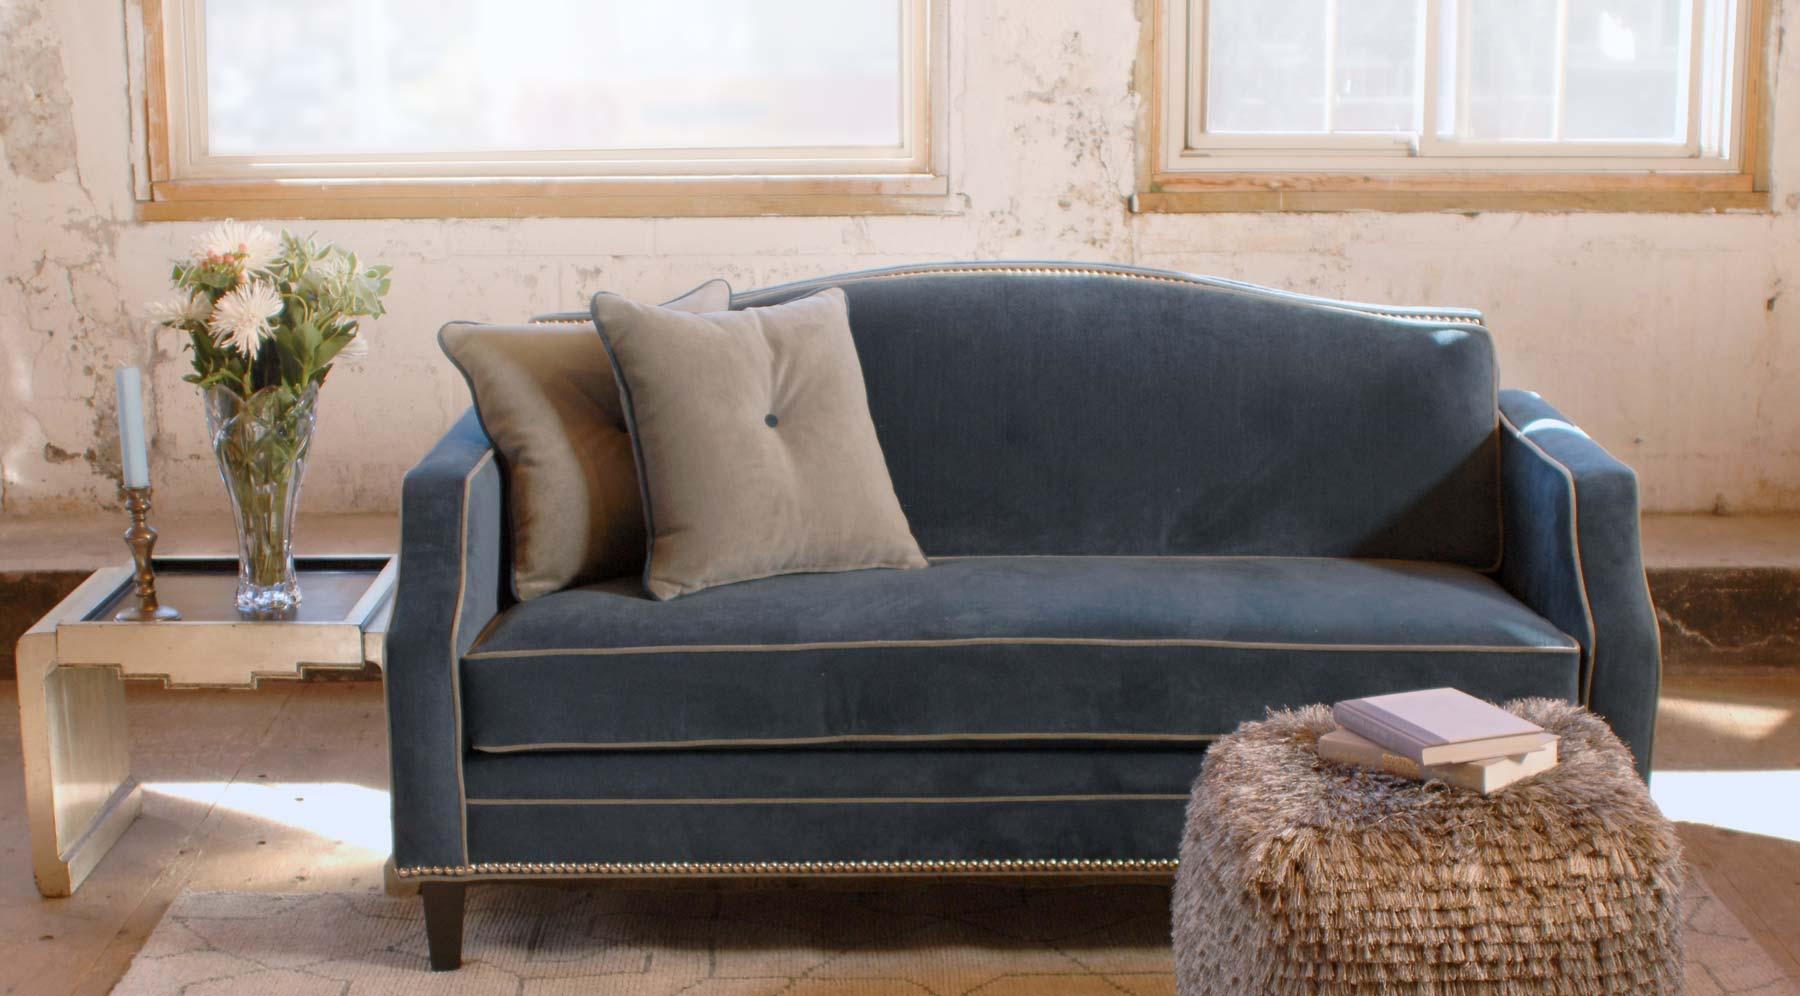 Harrington Galleries - Winter inspired decor - blue sofa